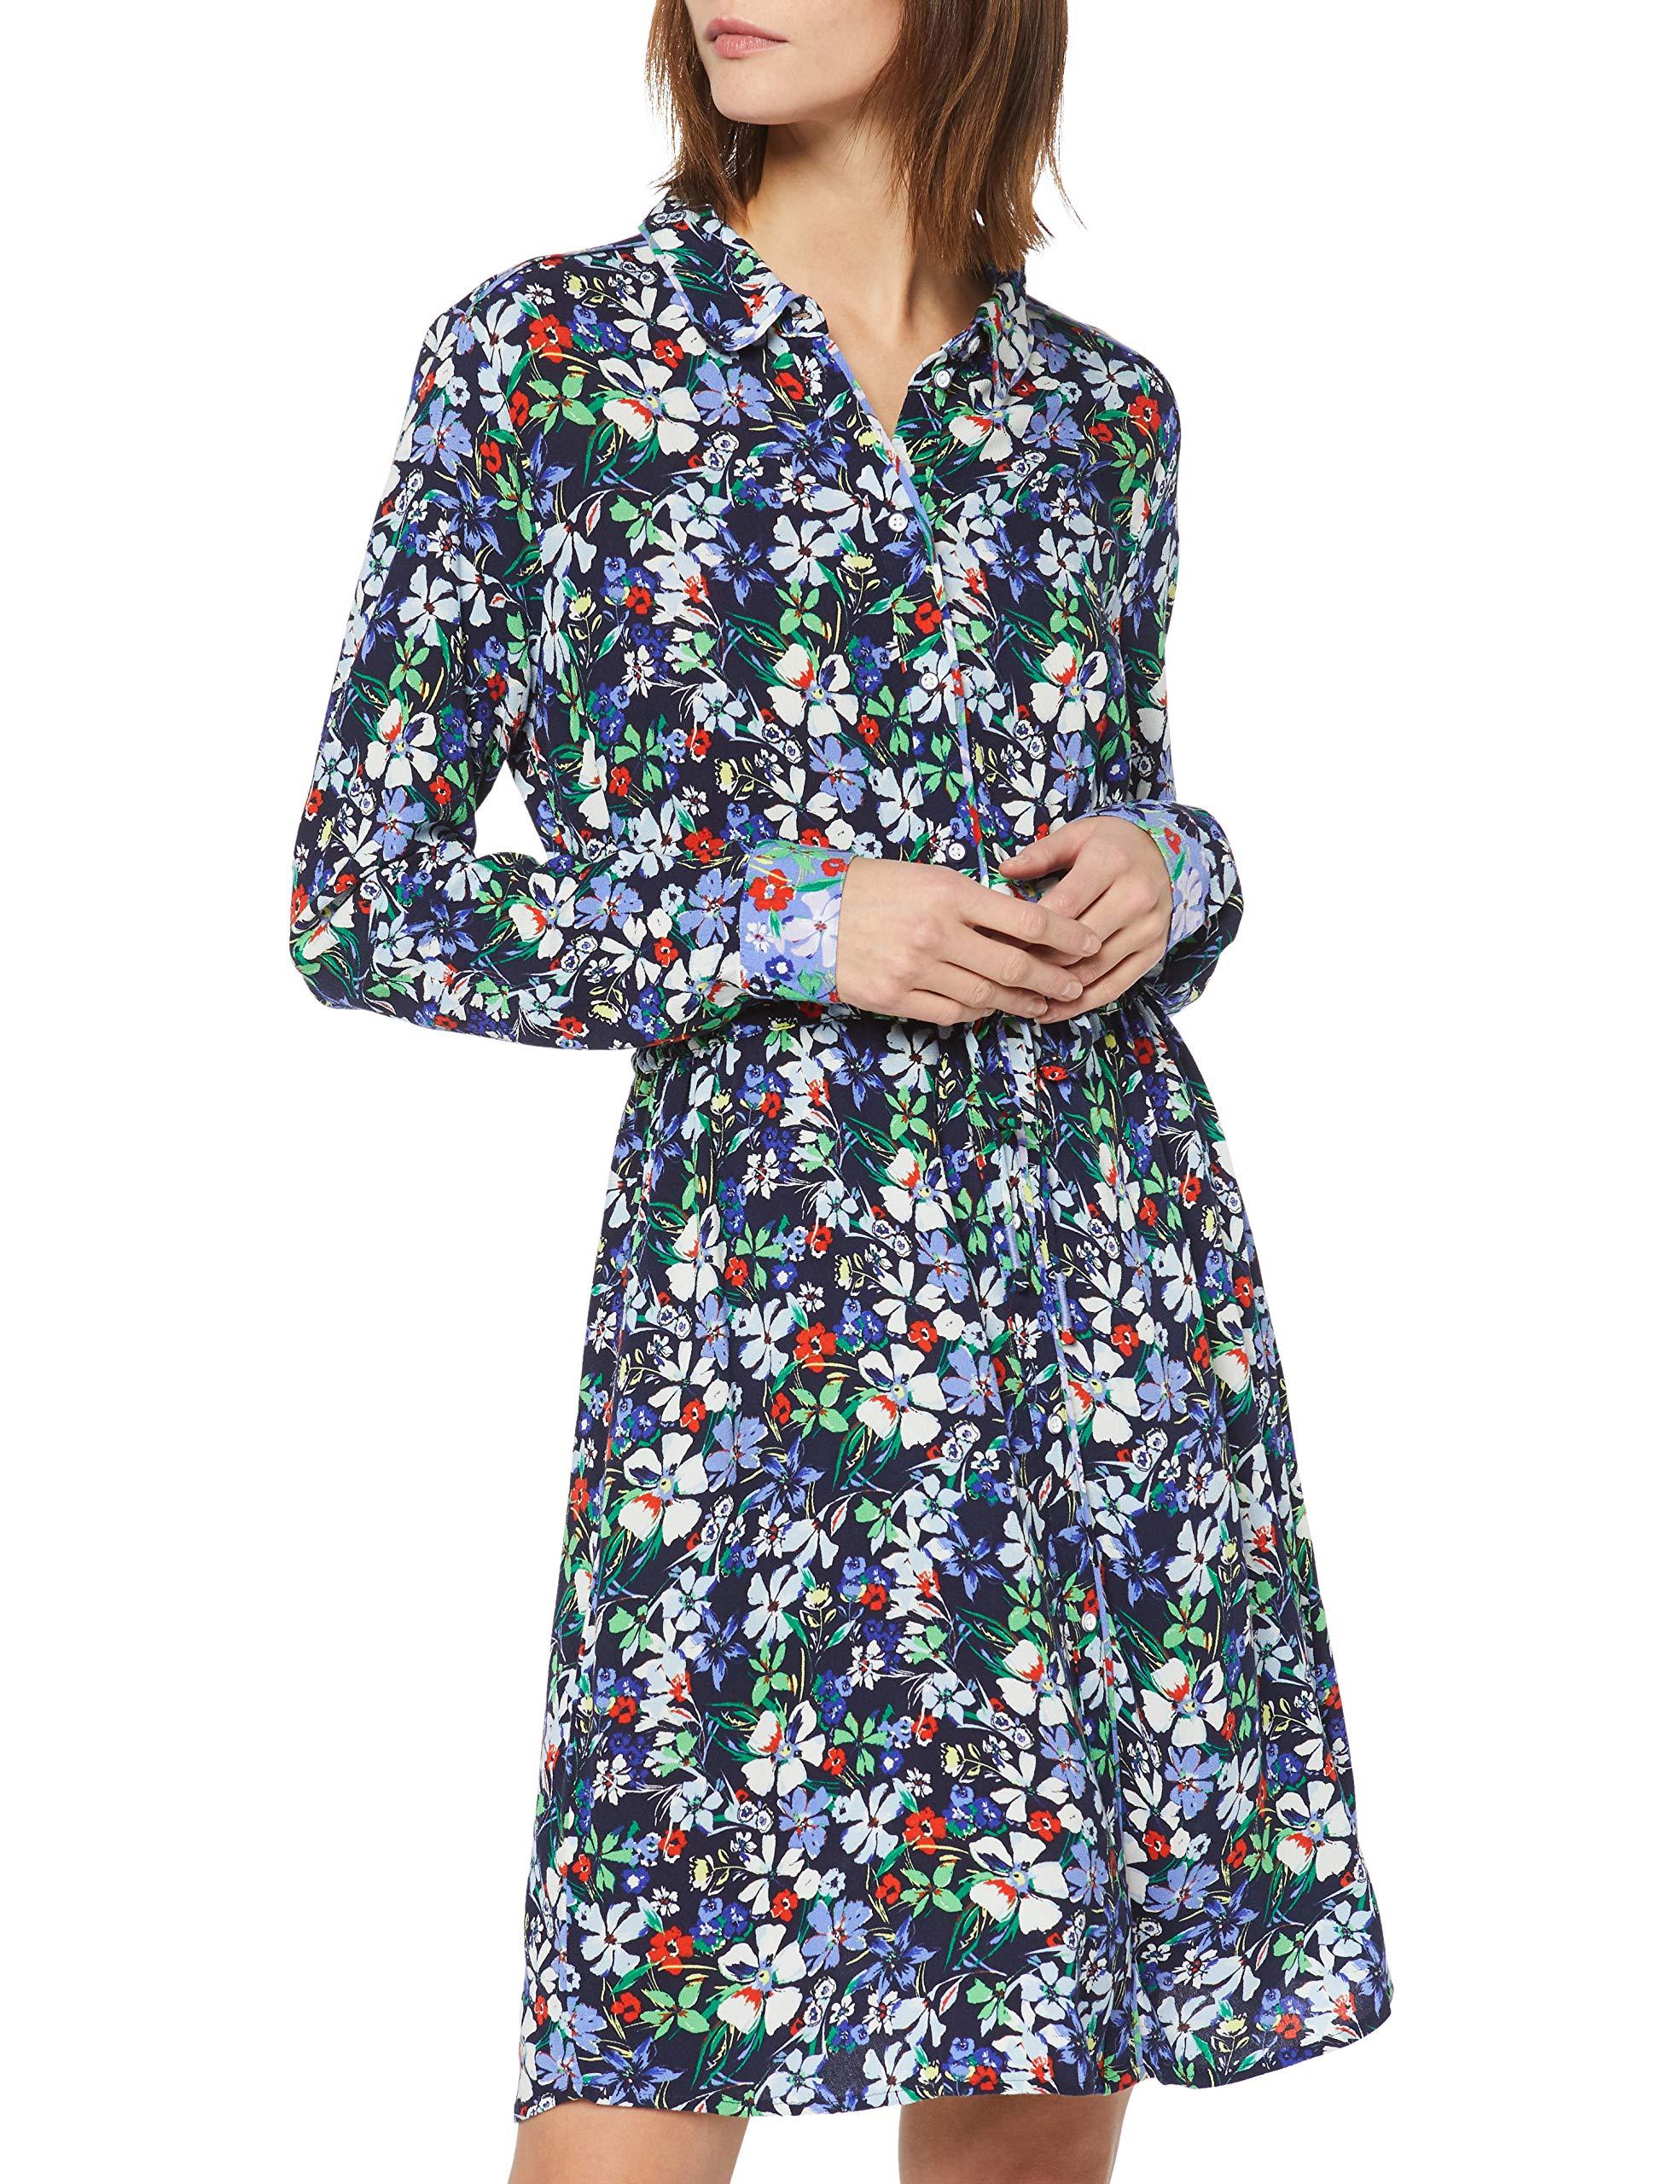 largeFemme RobeMulticoloreflower FabricantXx Denim Tailor 15874Smalltaille Tom 1009894 Design DWIH29E